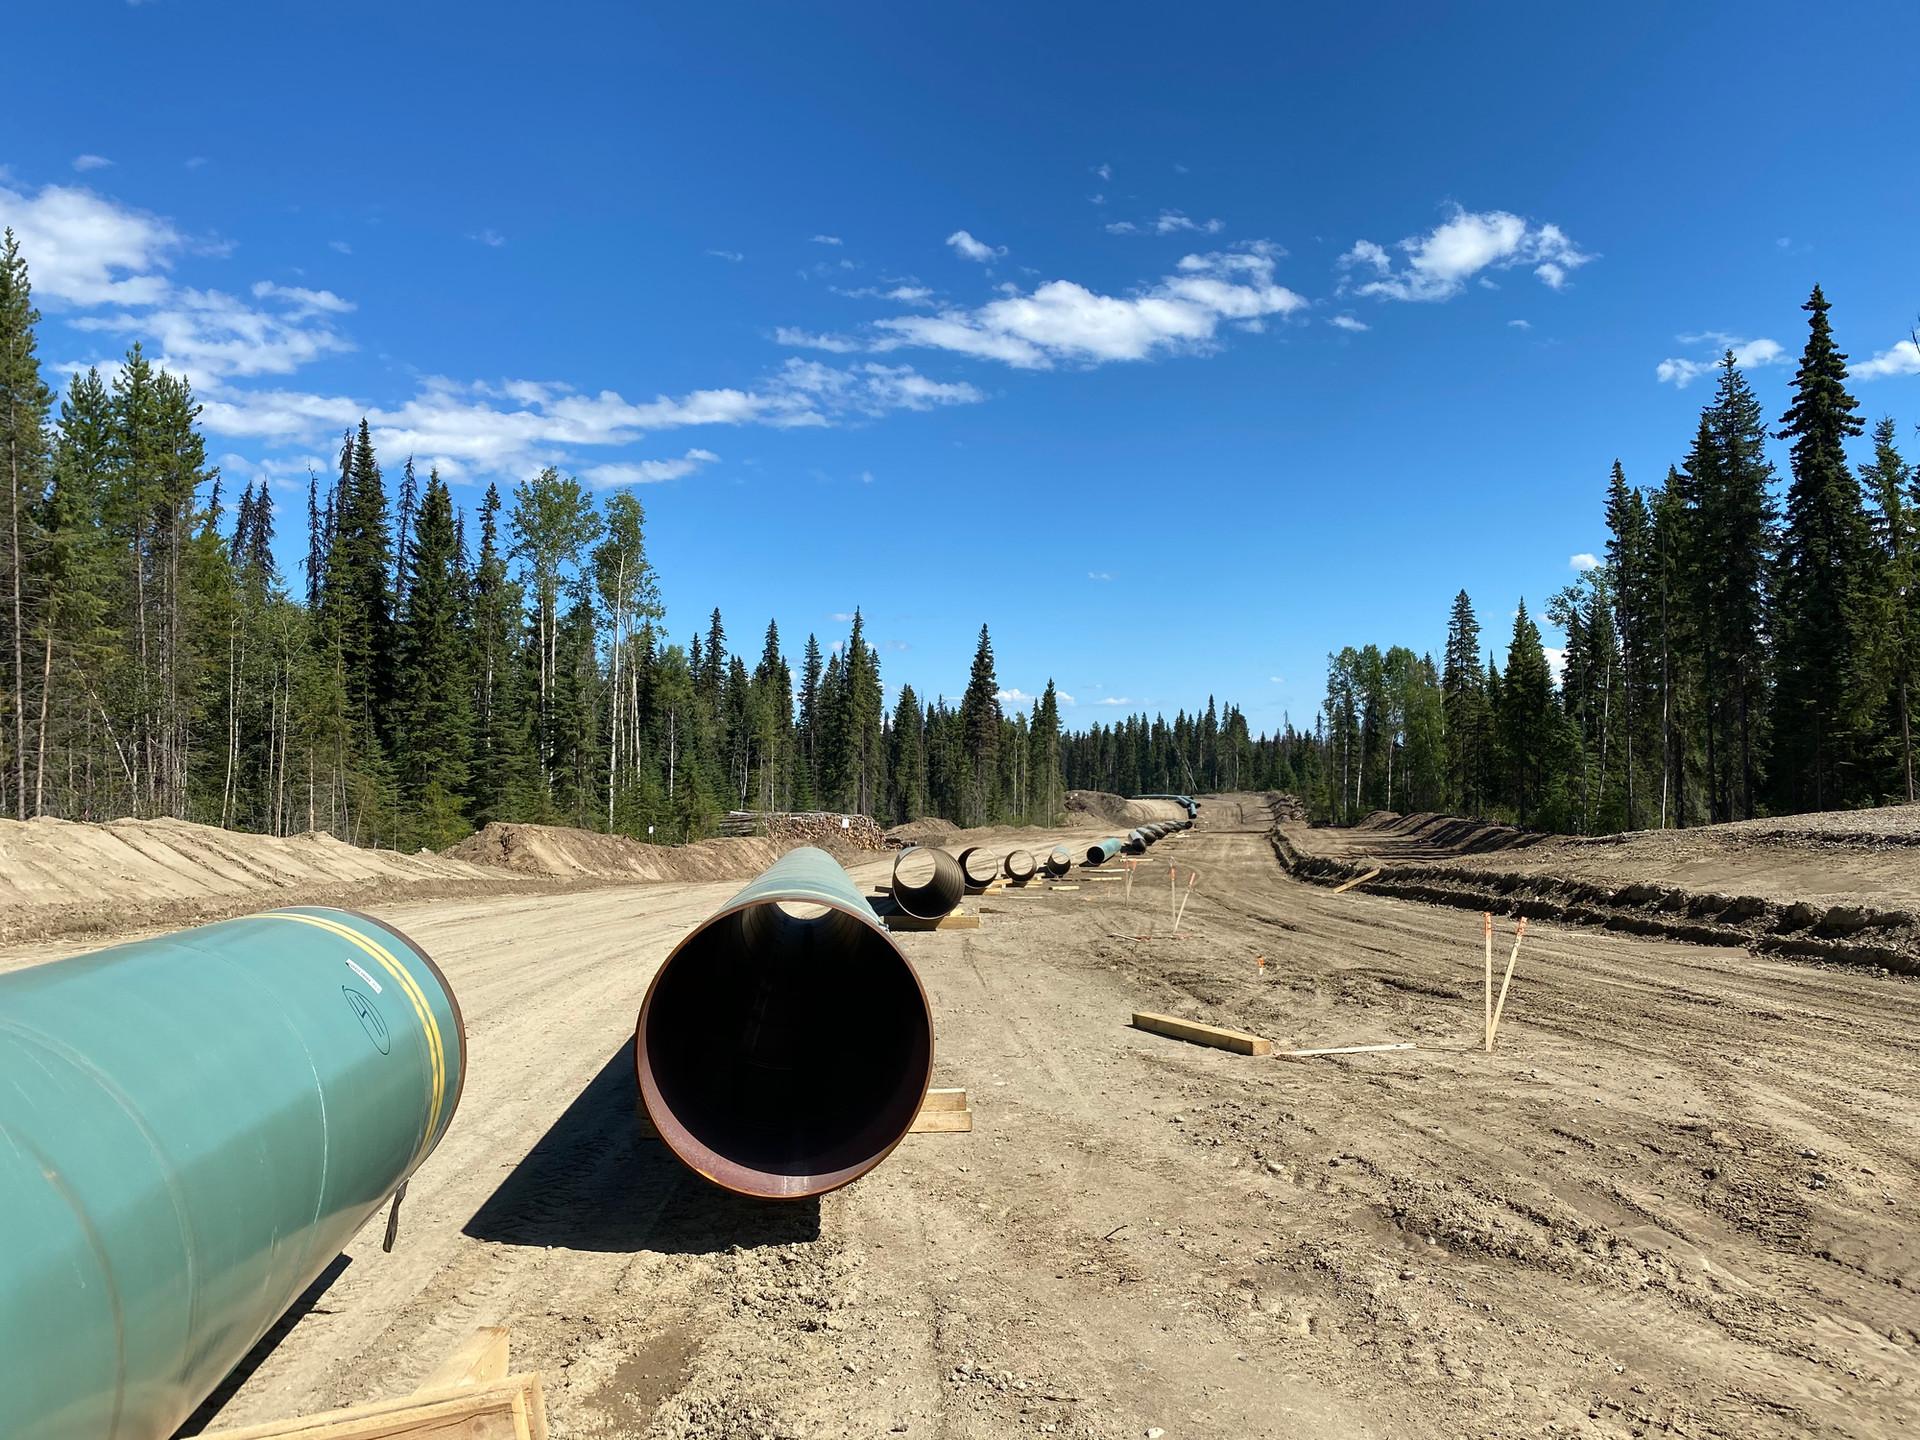 Global Raymac pipeline survey team on site